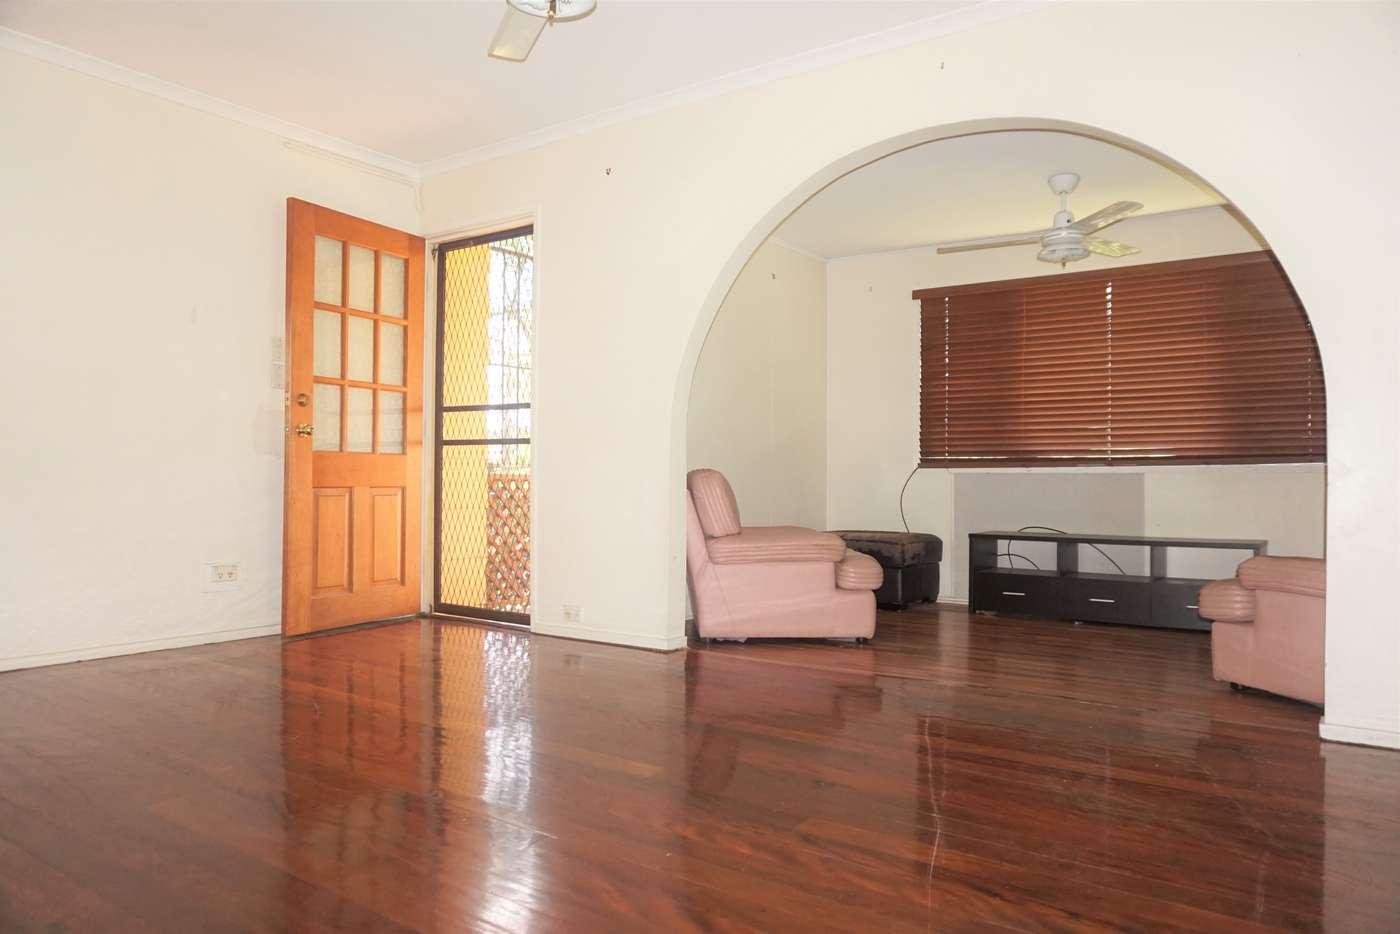 Main view of Homely house listing, 32 Huron Street, Woodridge QLD 4114